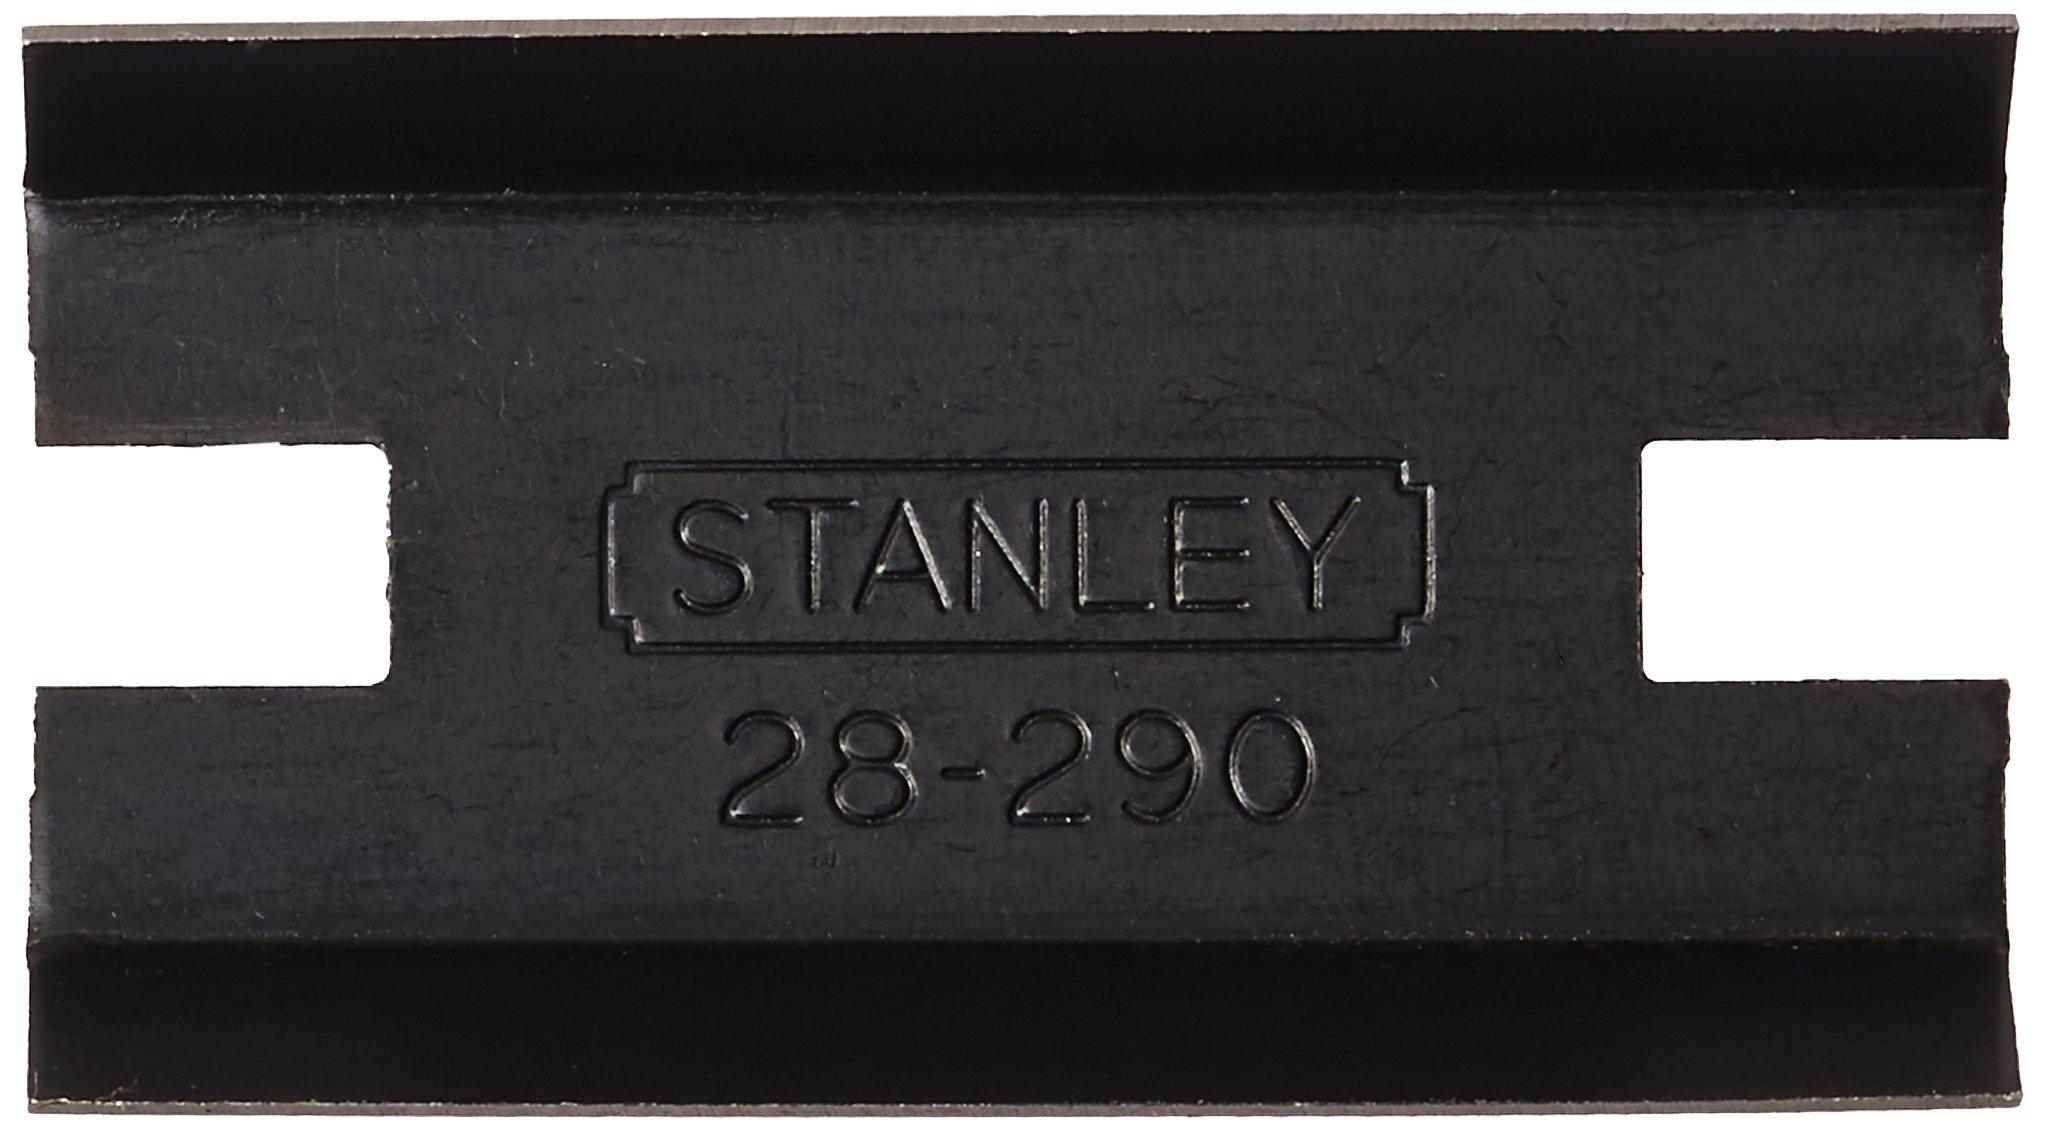 Stanley 28-290 Scraper Blade 1-1/2 Inch, Pack of 1 by Stanley (Image #1)